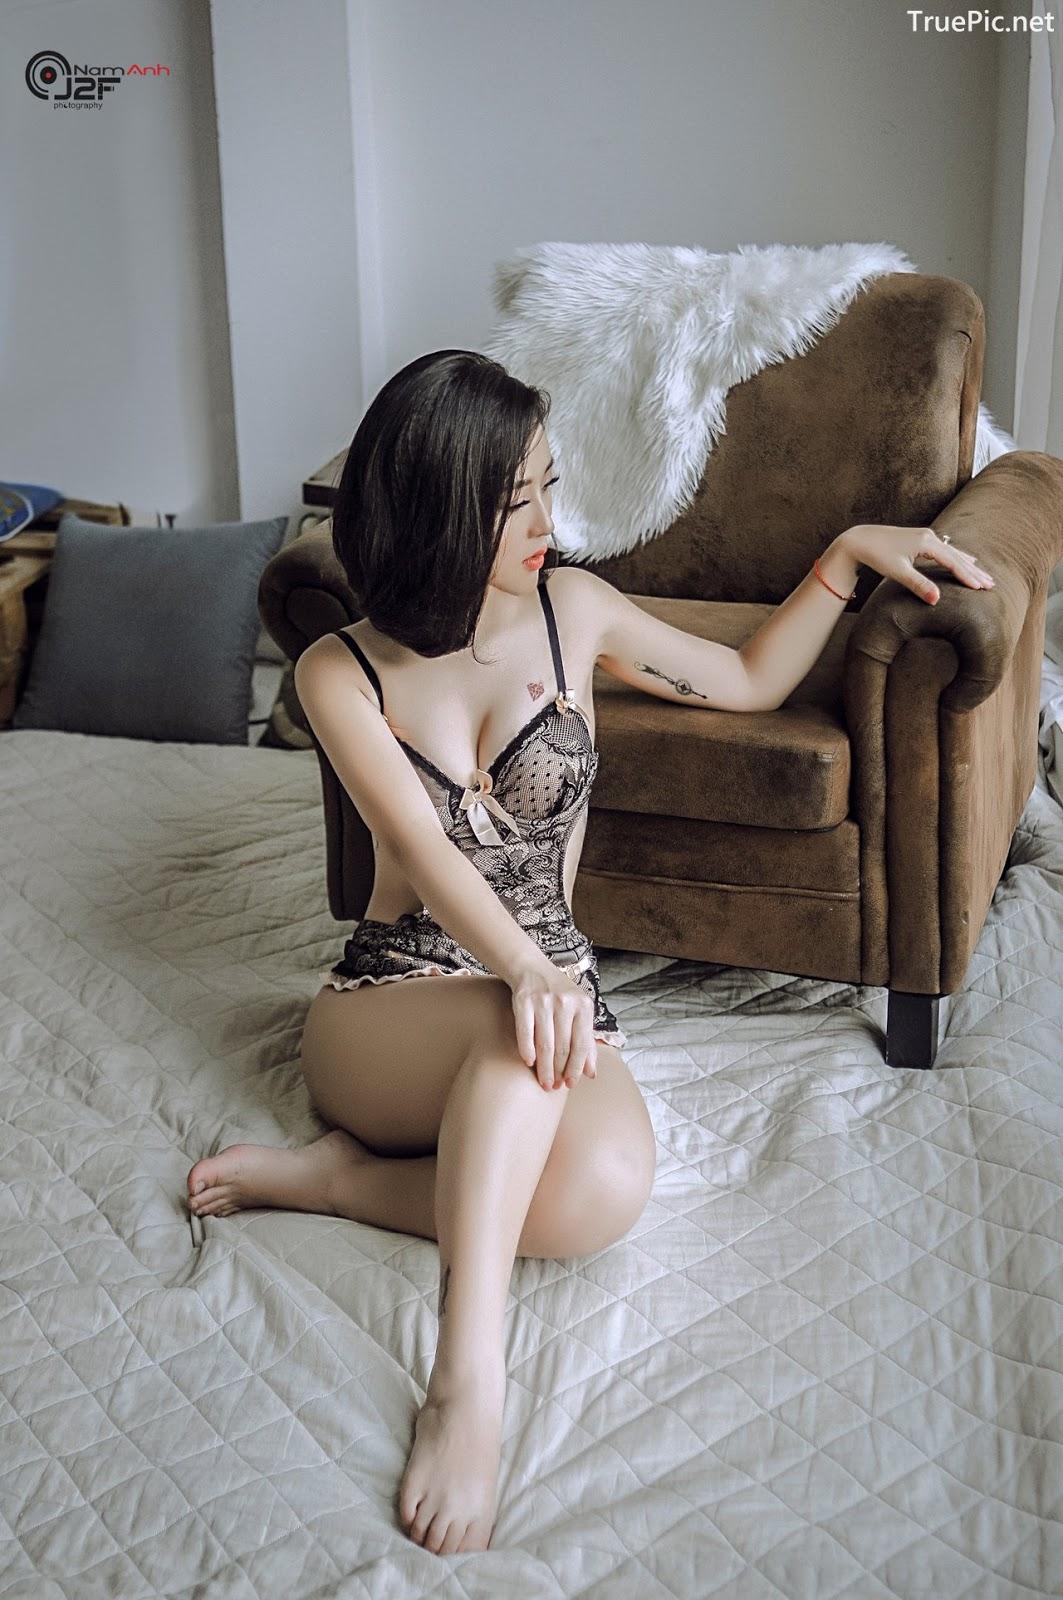 Image Vietnamese Model – Sexy Beauty of Beautiful Girls Taken by NamAnh Photo #6 - TruePic.net - Picture-3